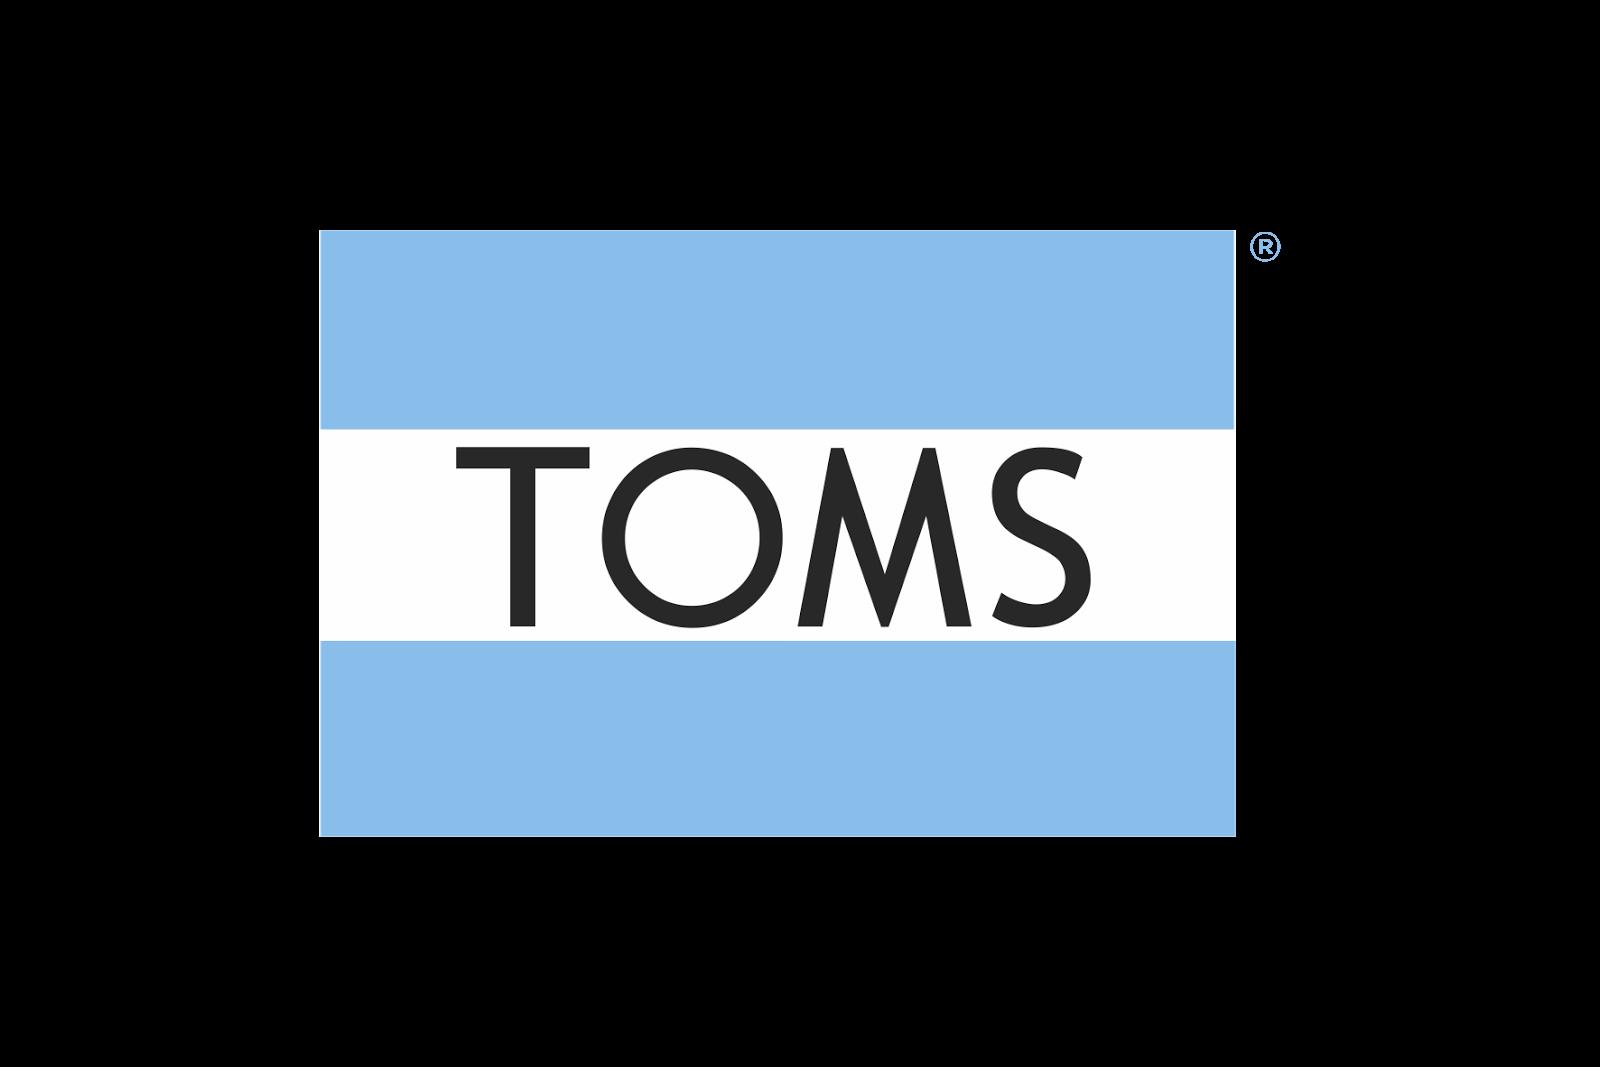 Toms Shoes Logo Transparent & PNG Clipart Free Download.